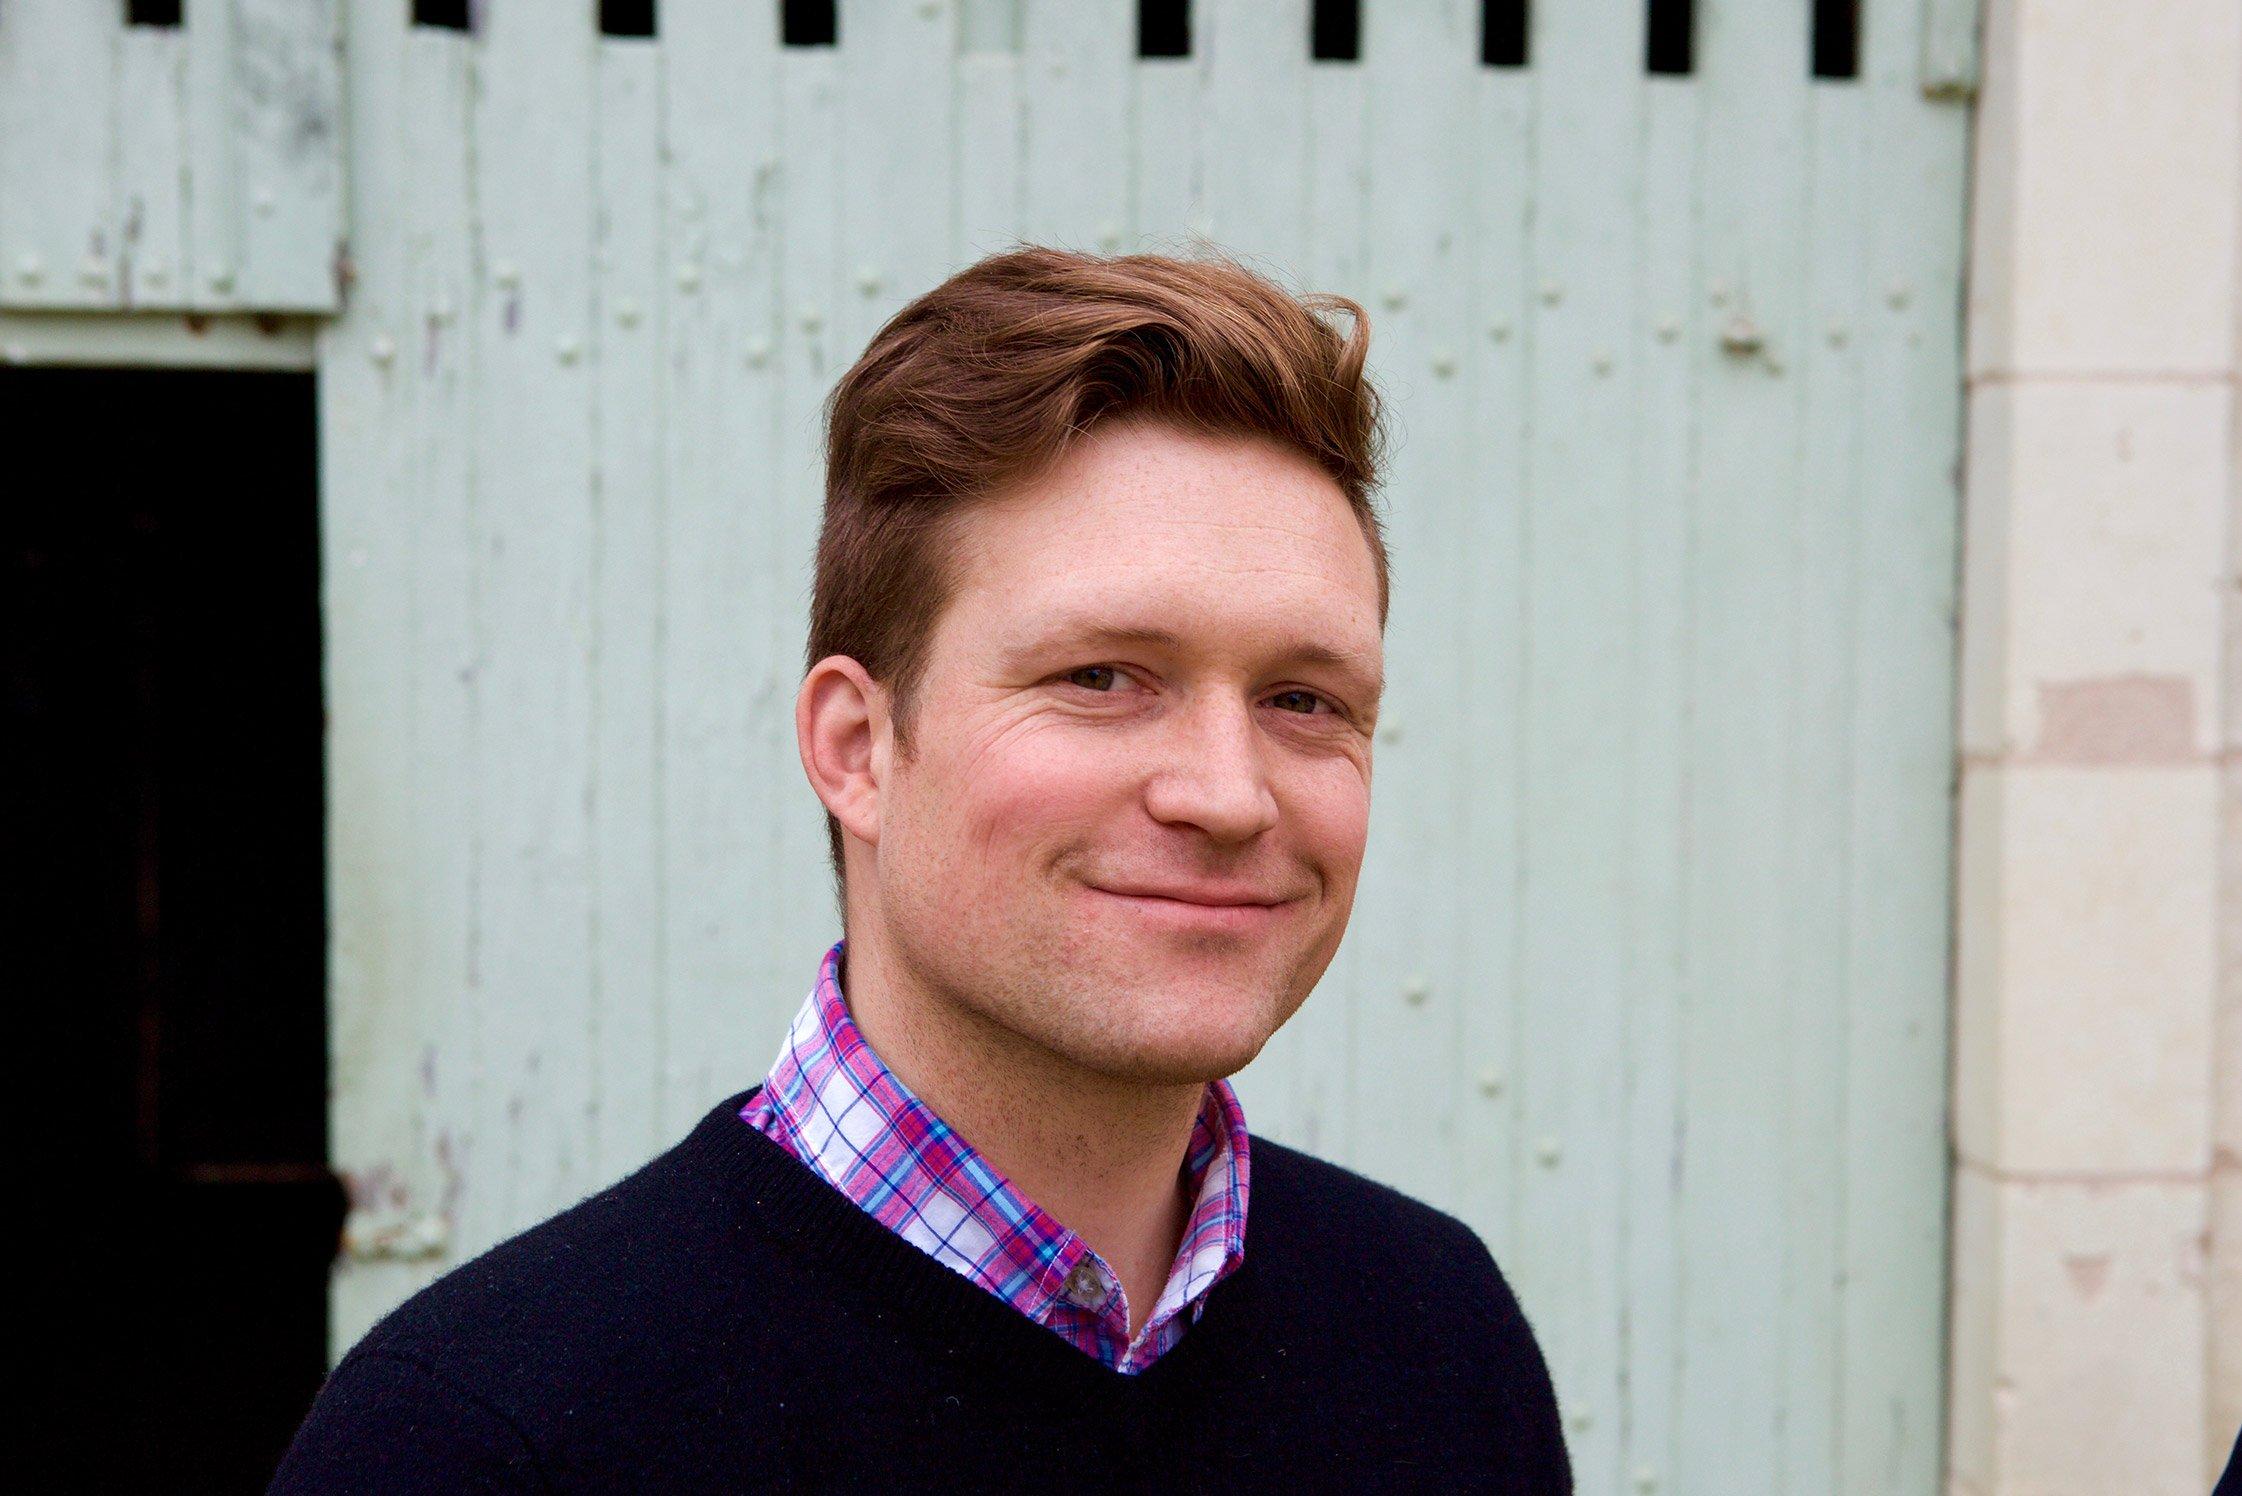 Brendan Stater-West winemaker from Saumur France